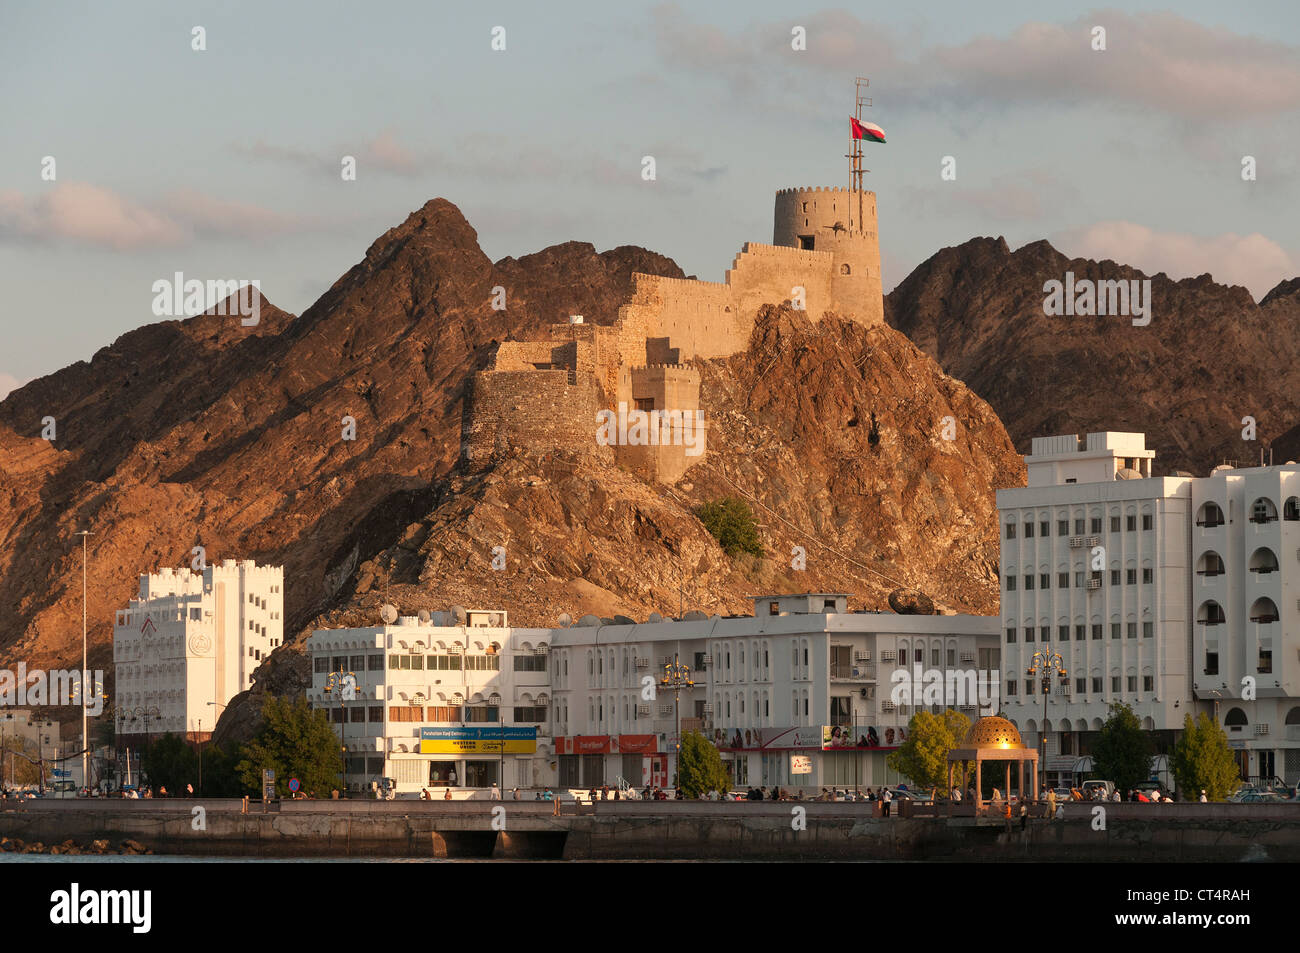 Elk207-1117 Oman, Muscat Muttrah, Corniche Immagini Stock